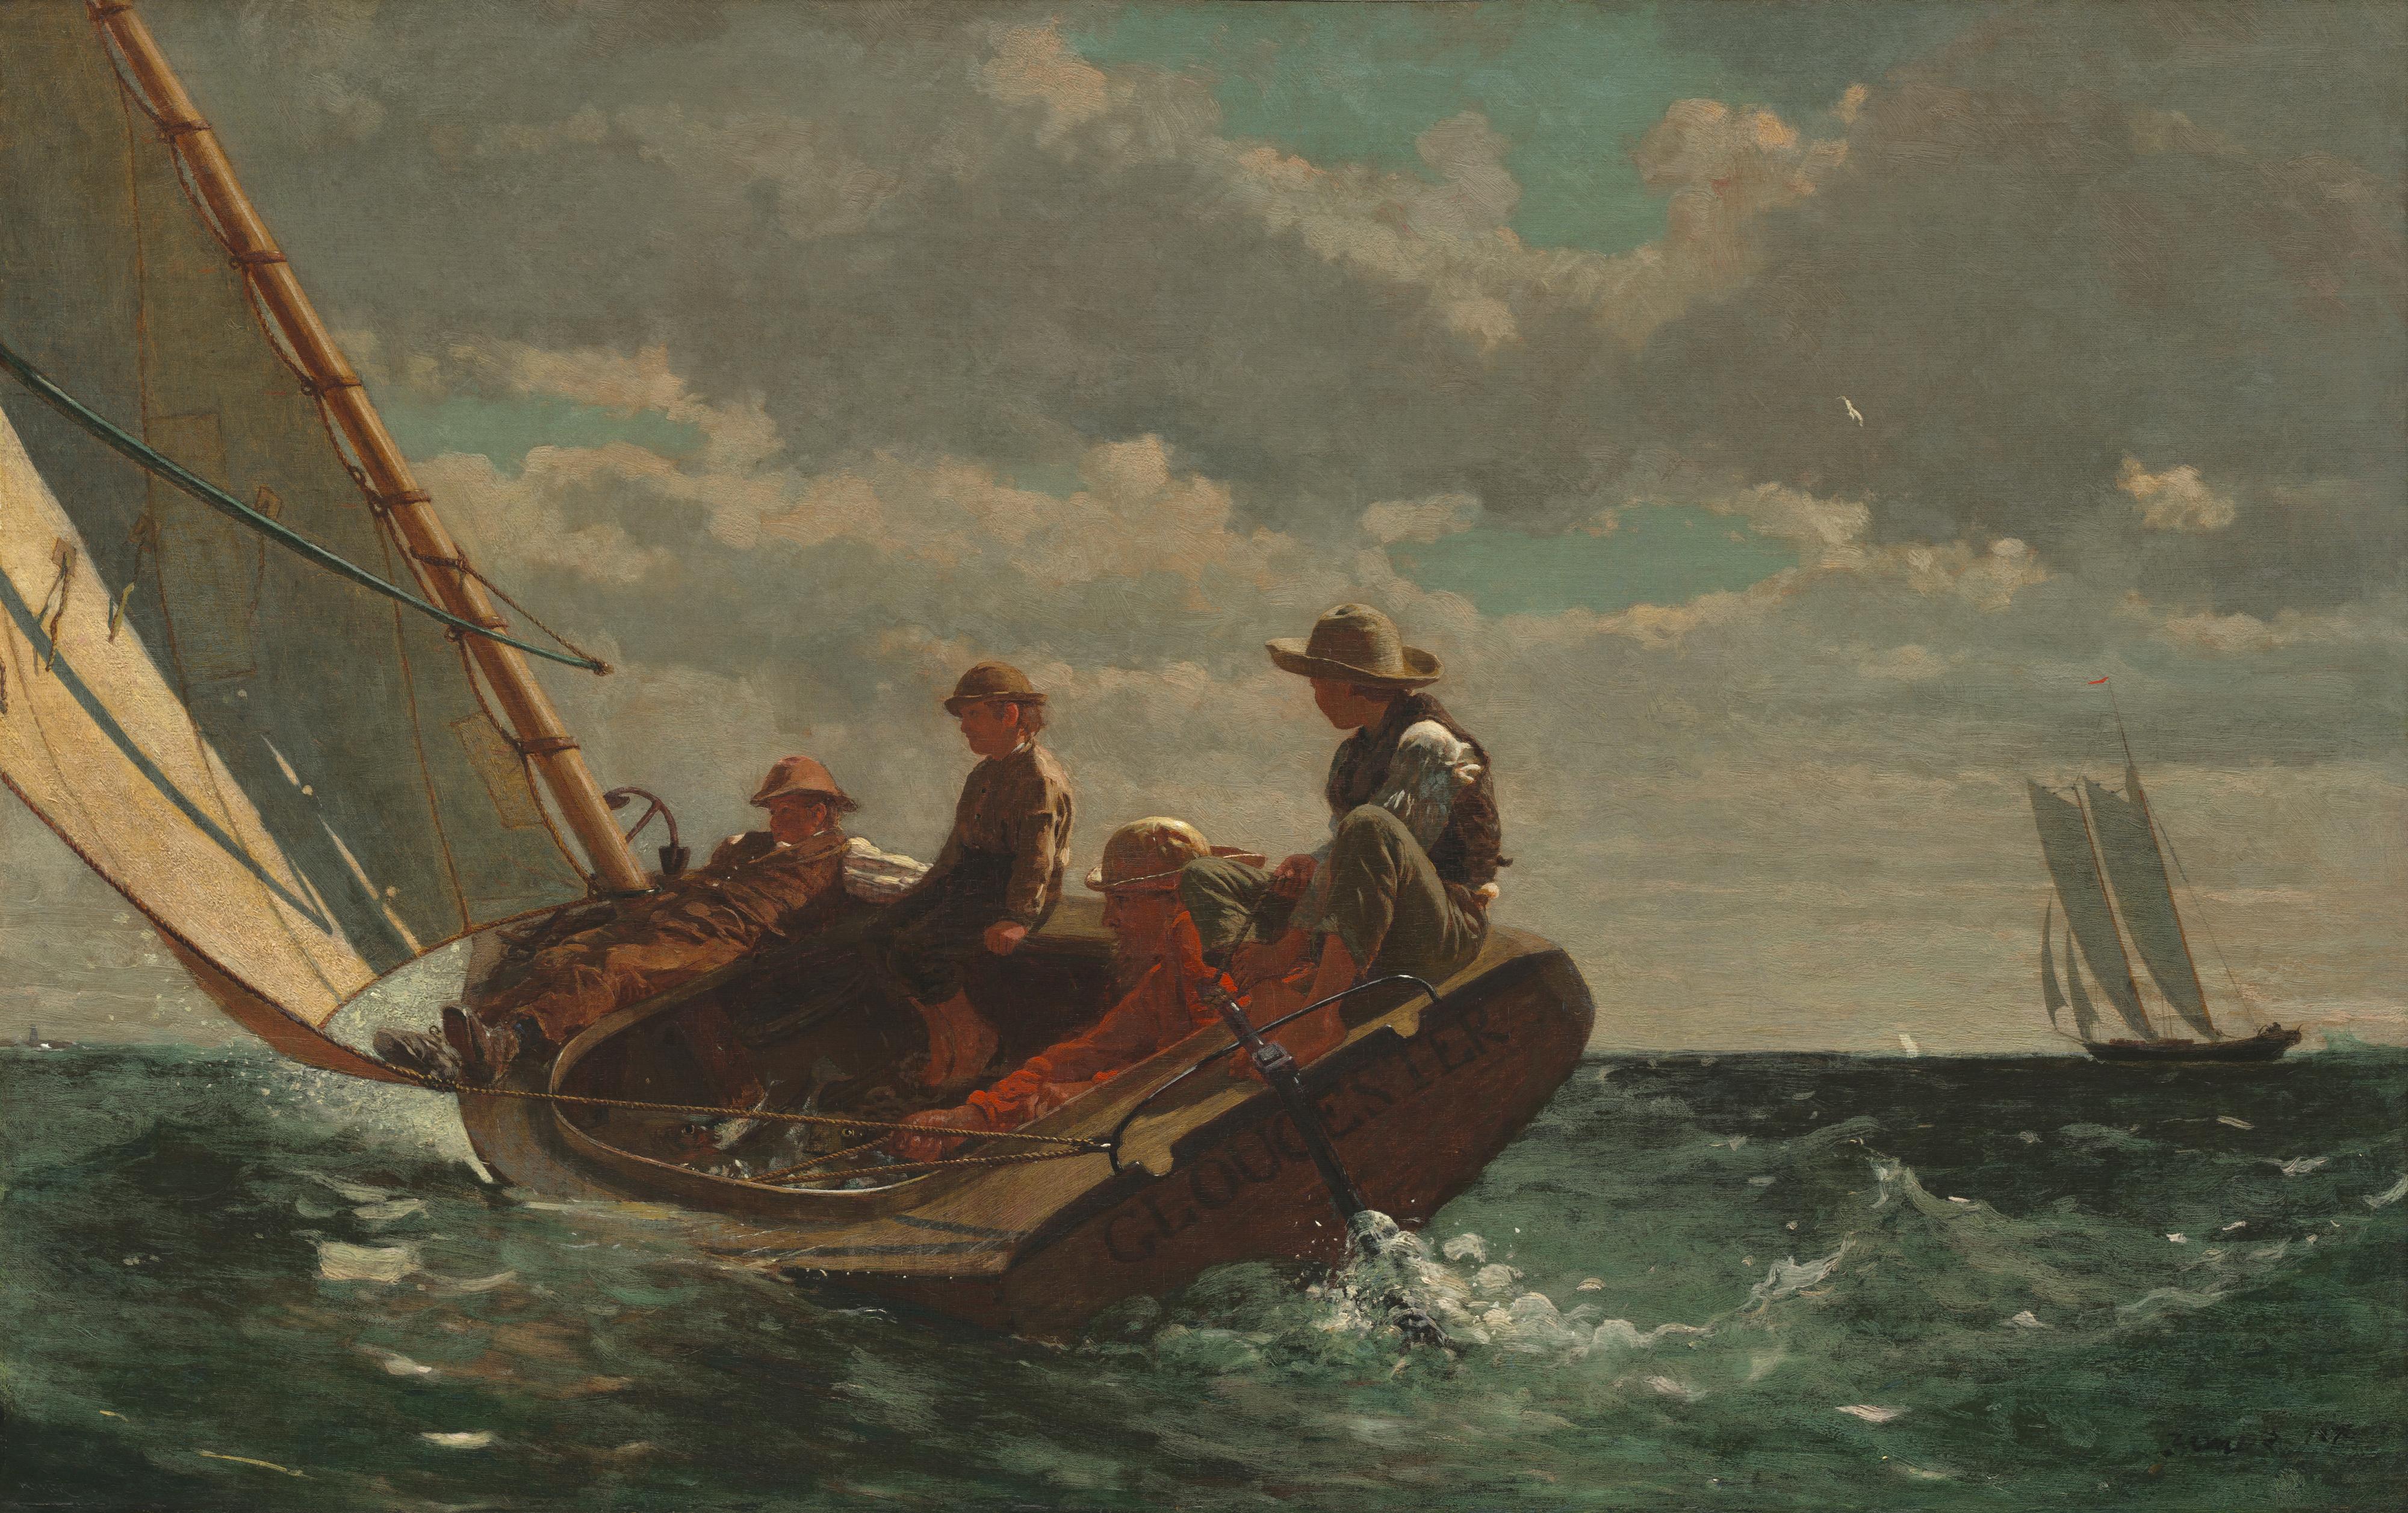 Winslow_Homer%2C_Breezing_Up_(A_Fair_Wind)%2C_1873-1876%2C_NGA_30228